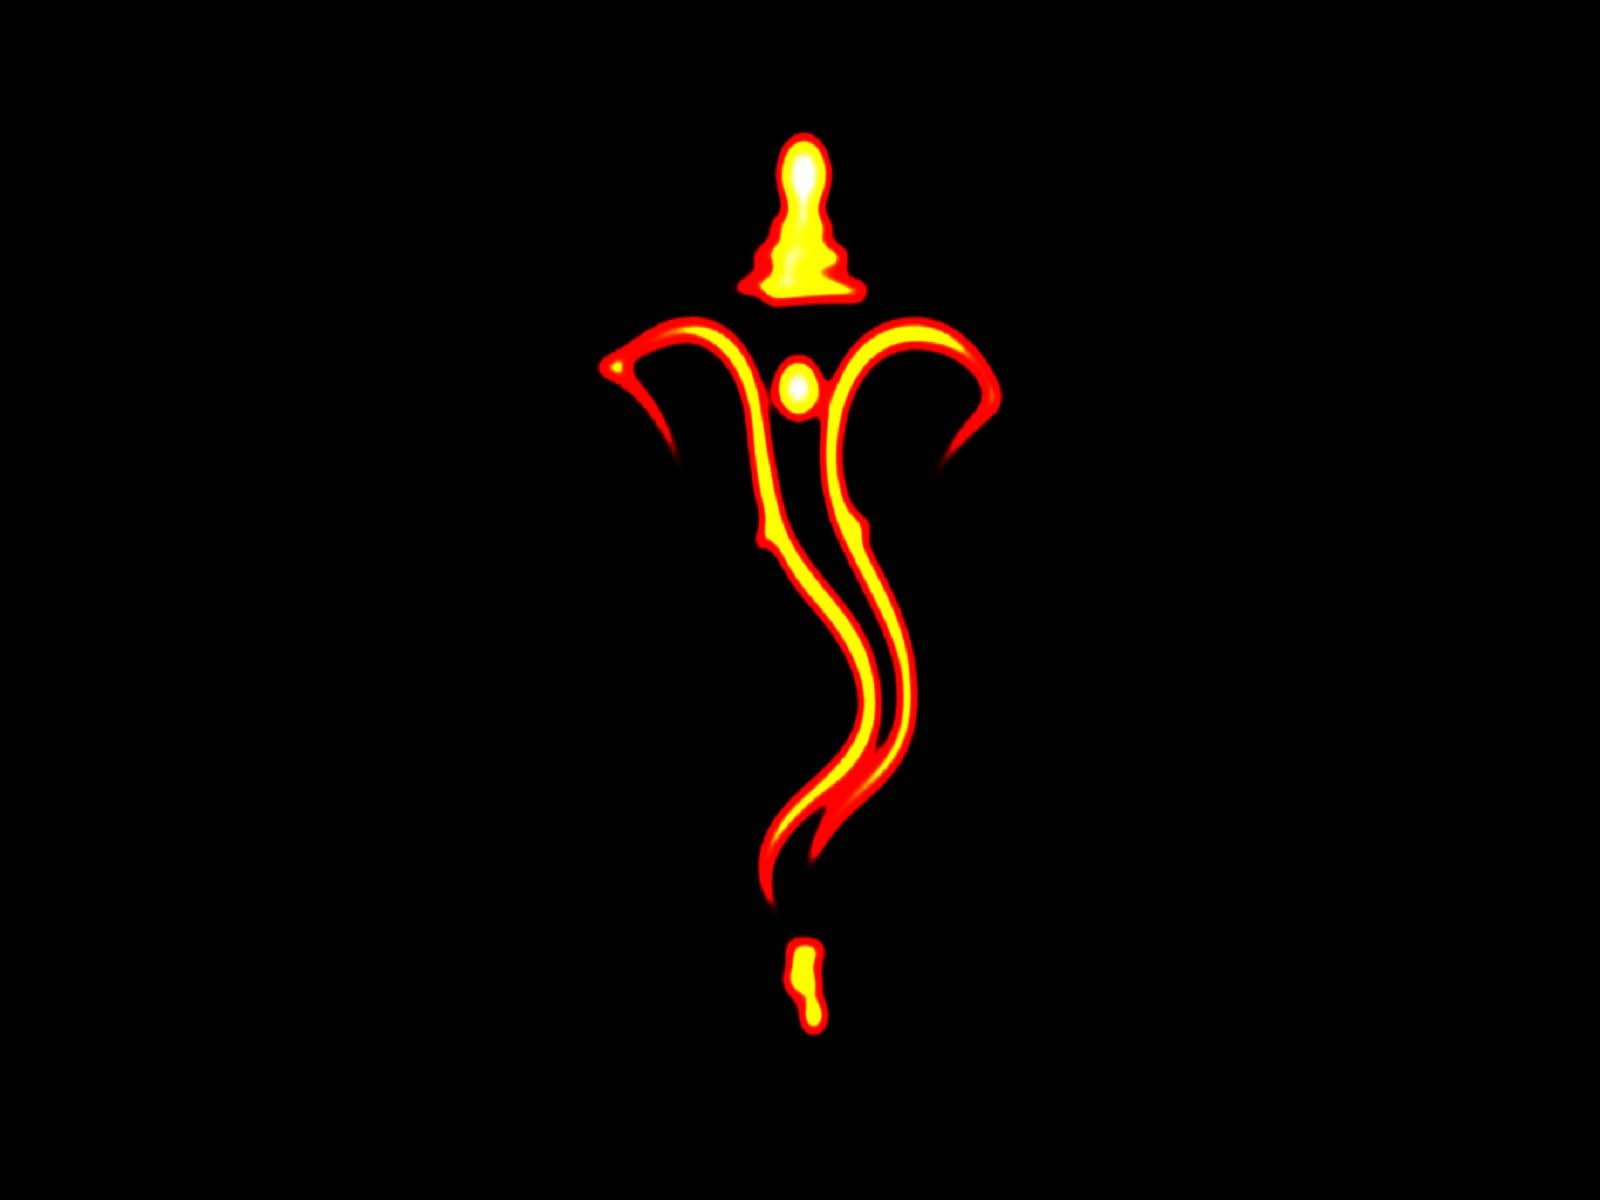 1600x1200 Suruchi: Ganpati Bappa Morya!